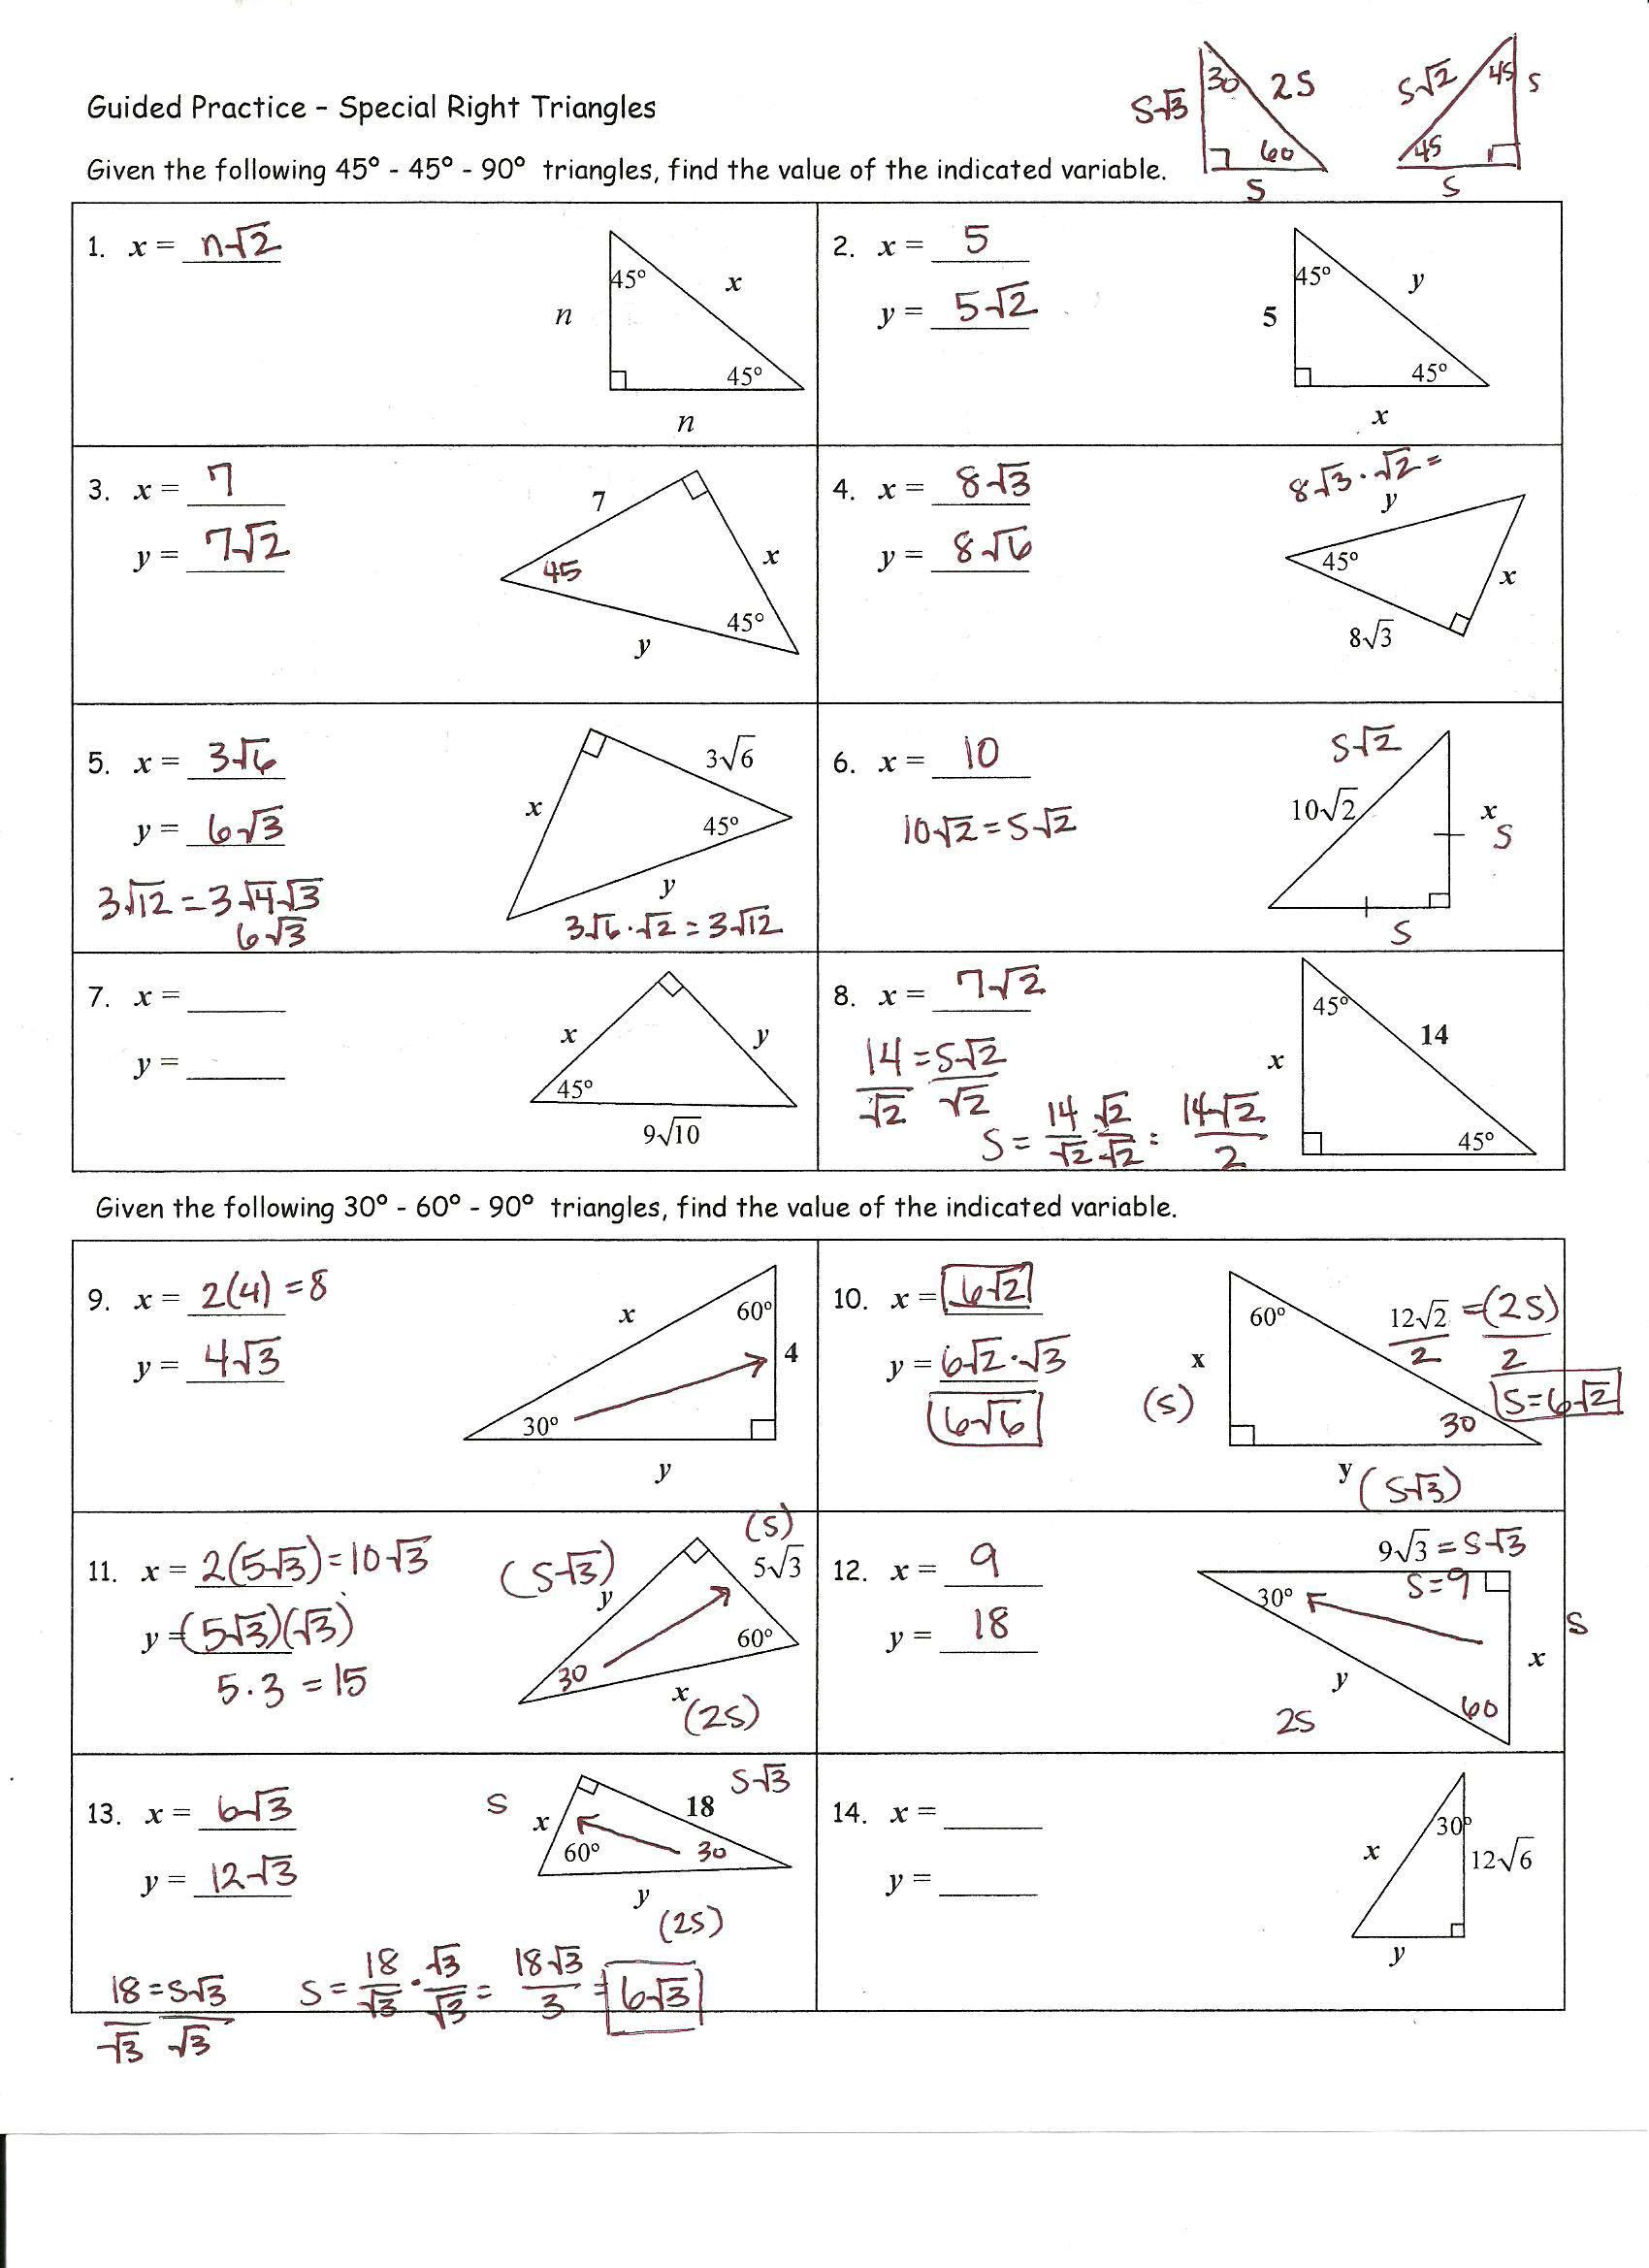 30 60 90 Triangle Worksheet Answer Key : triangle, worksheet, answer, Triangles, Worksheet, Spreadsheet